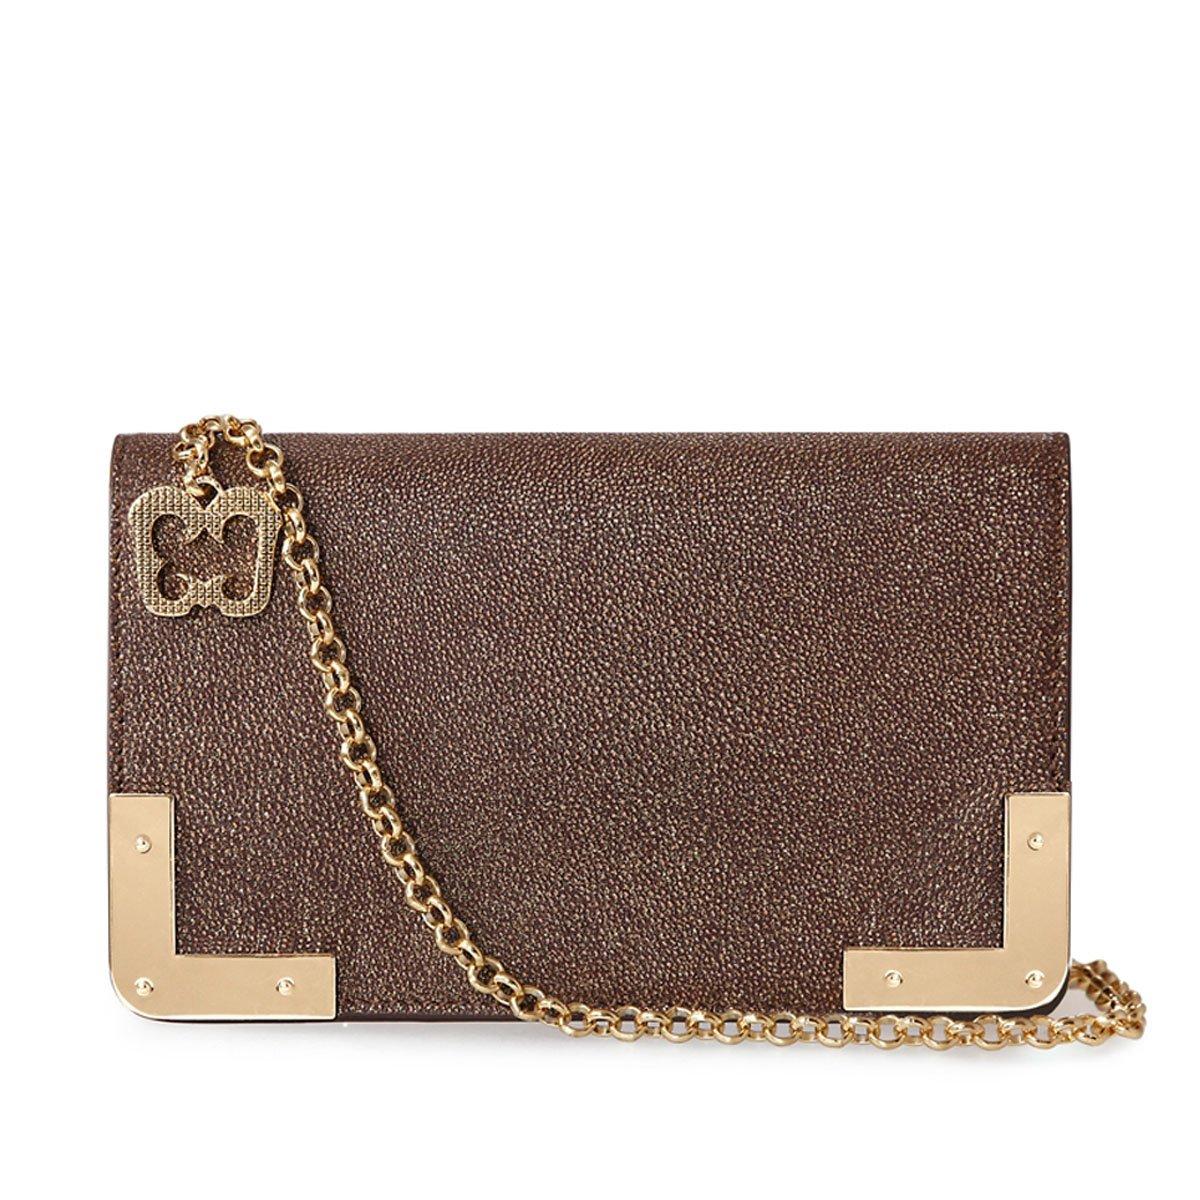 Eric Javits Luxury Fashion Designer Women's Handbag - Cassidy - Bronze